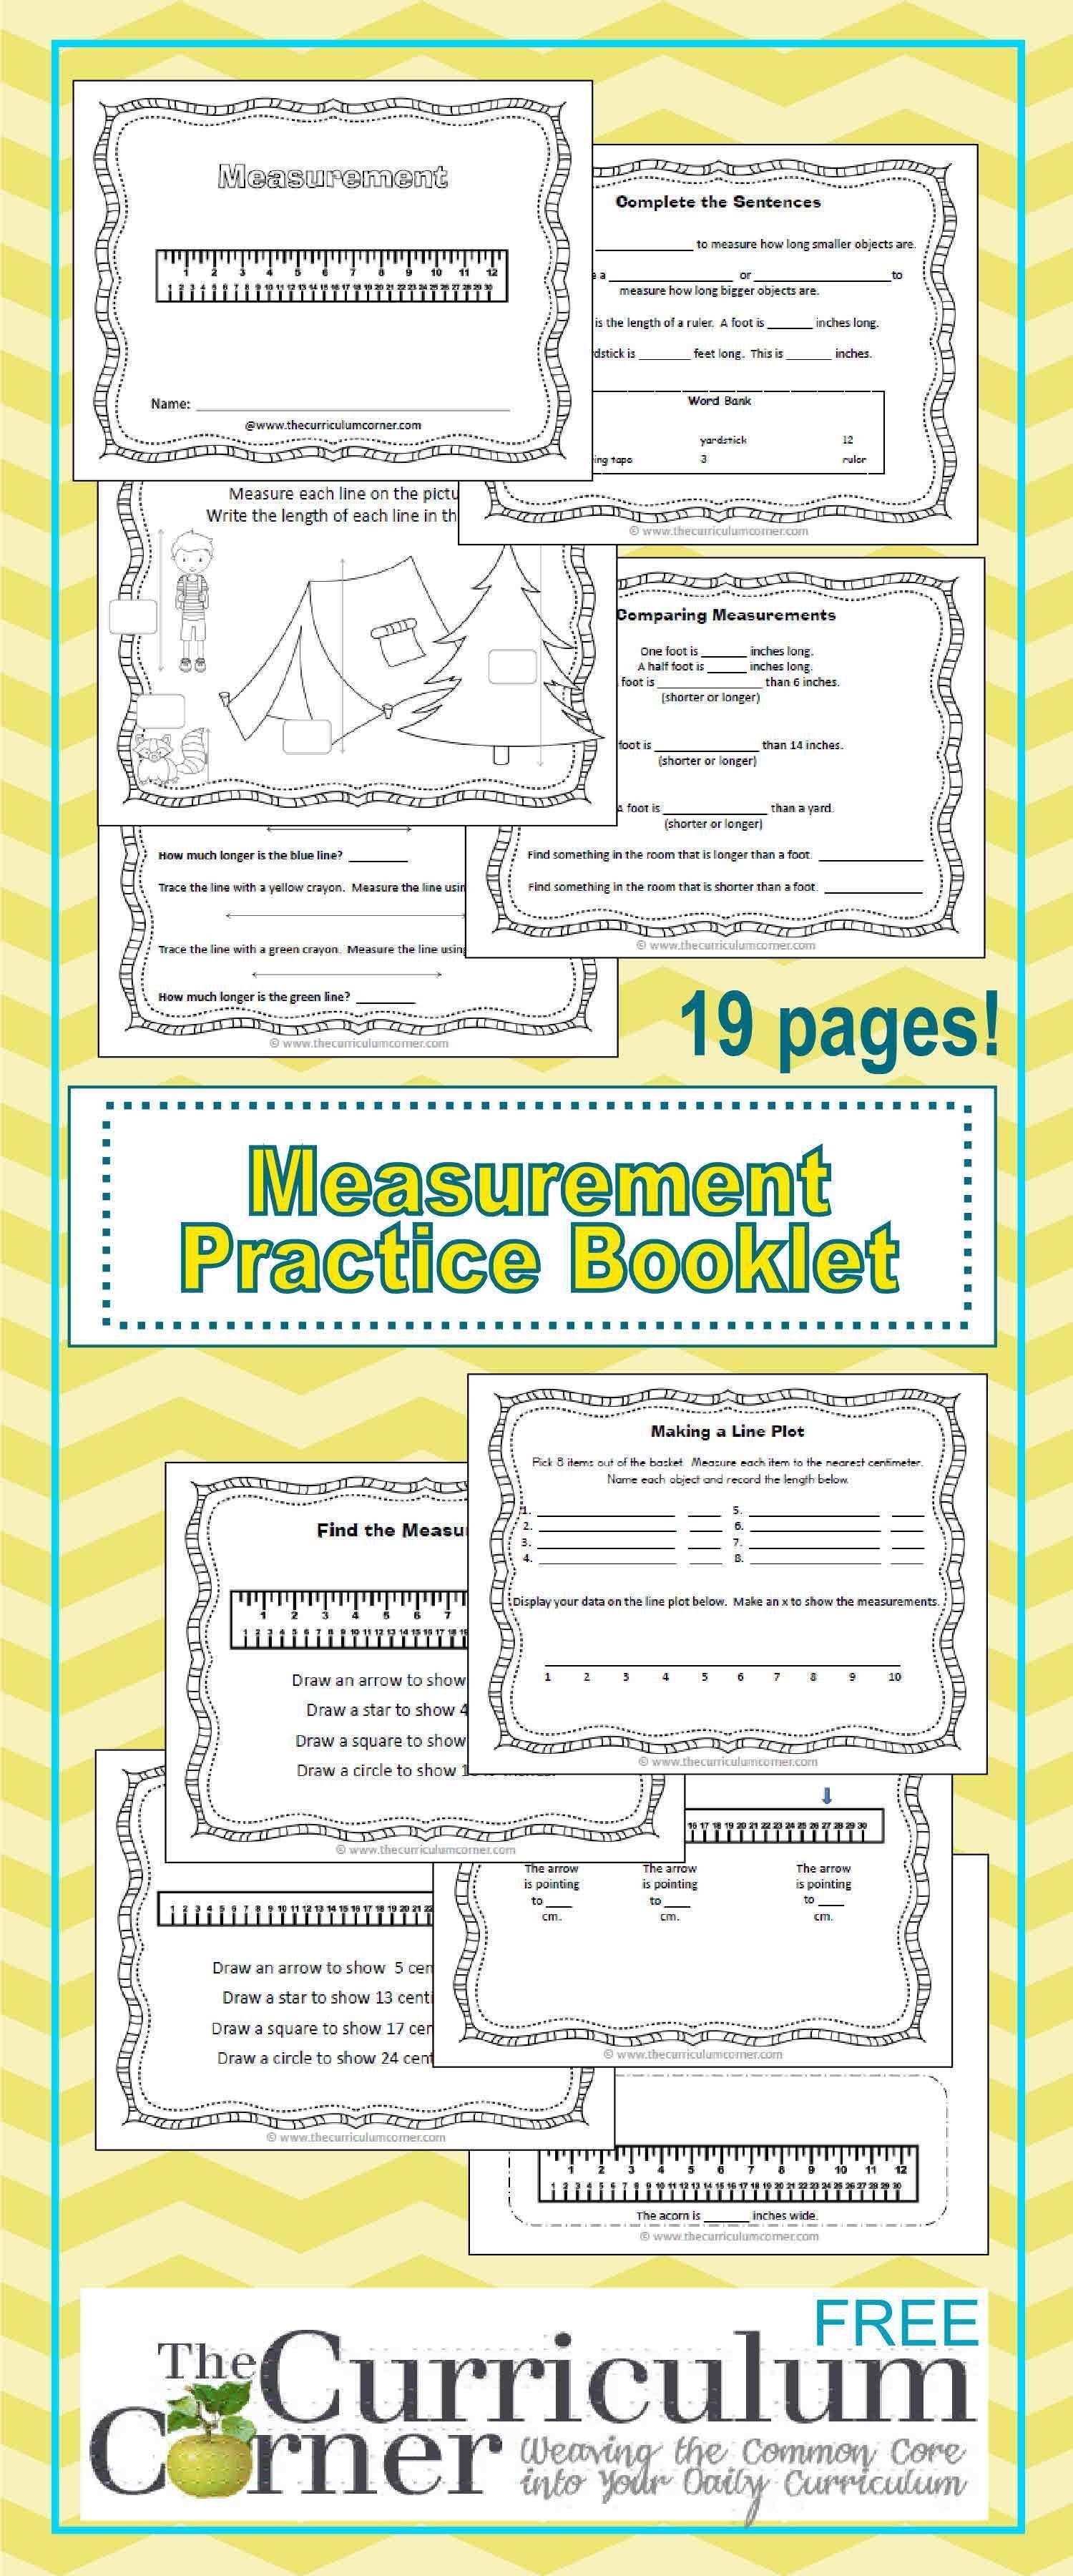 Linear Measurement Practice Booklet